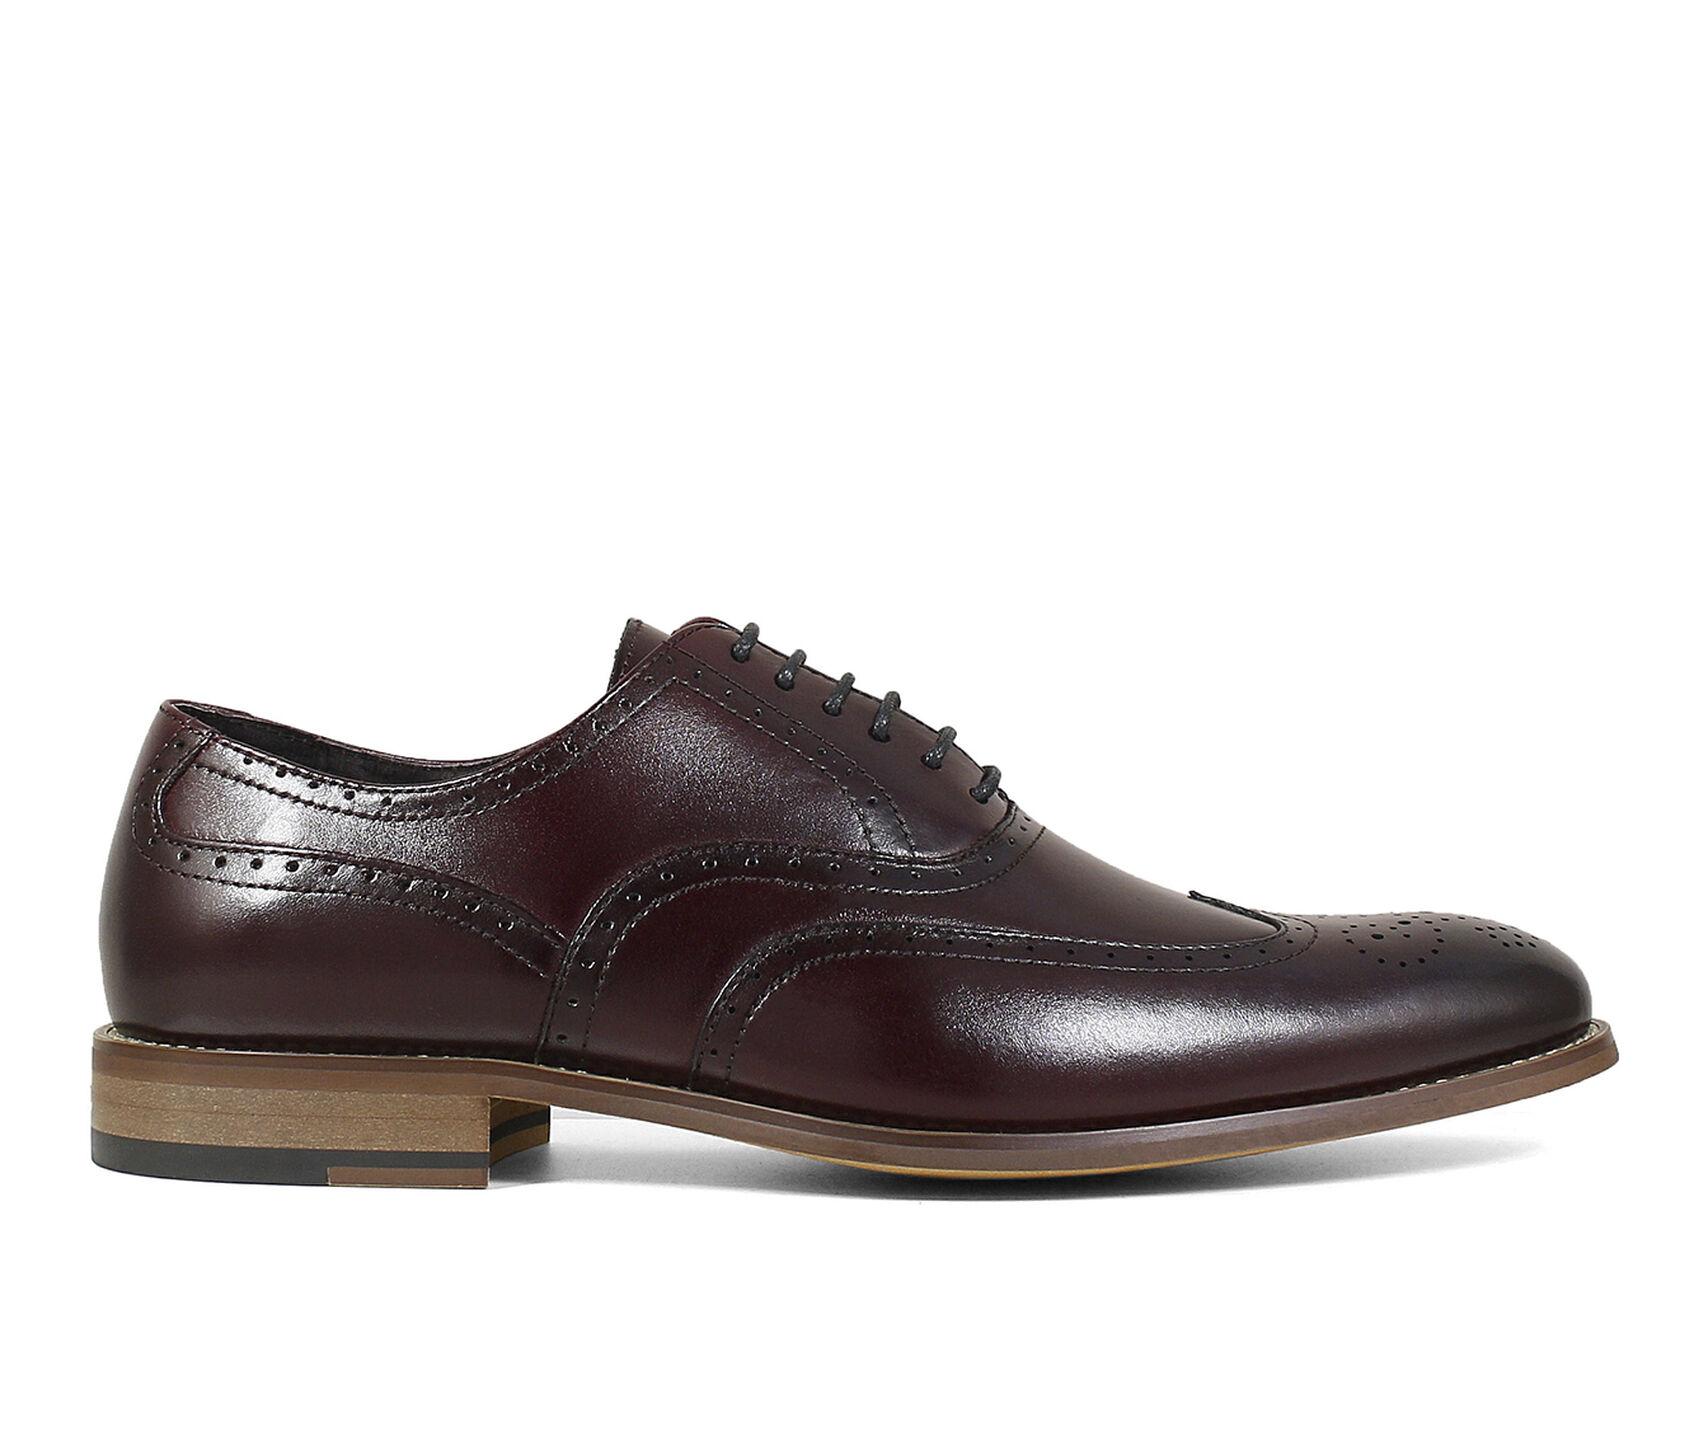 5368b5c45383e Men's Stacy Adams Dunbar Wingtip Wing Tip Dress Shoes | Shoe Carnival